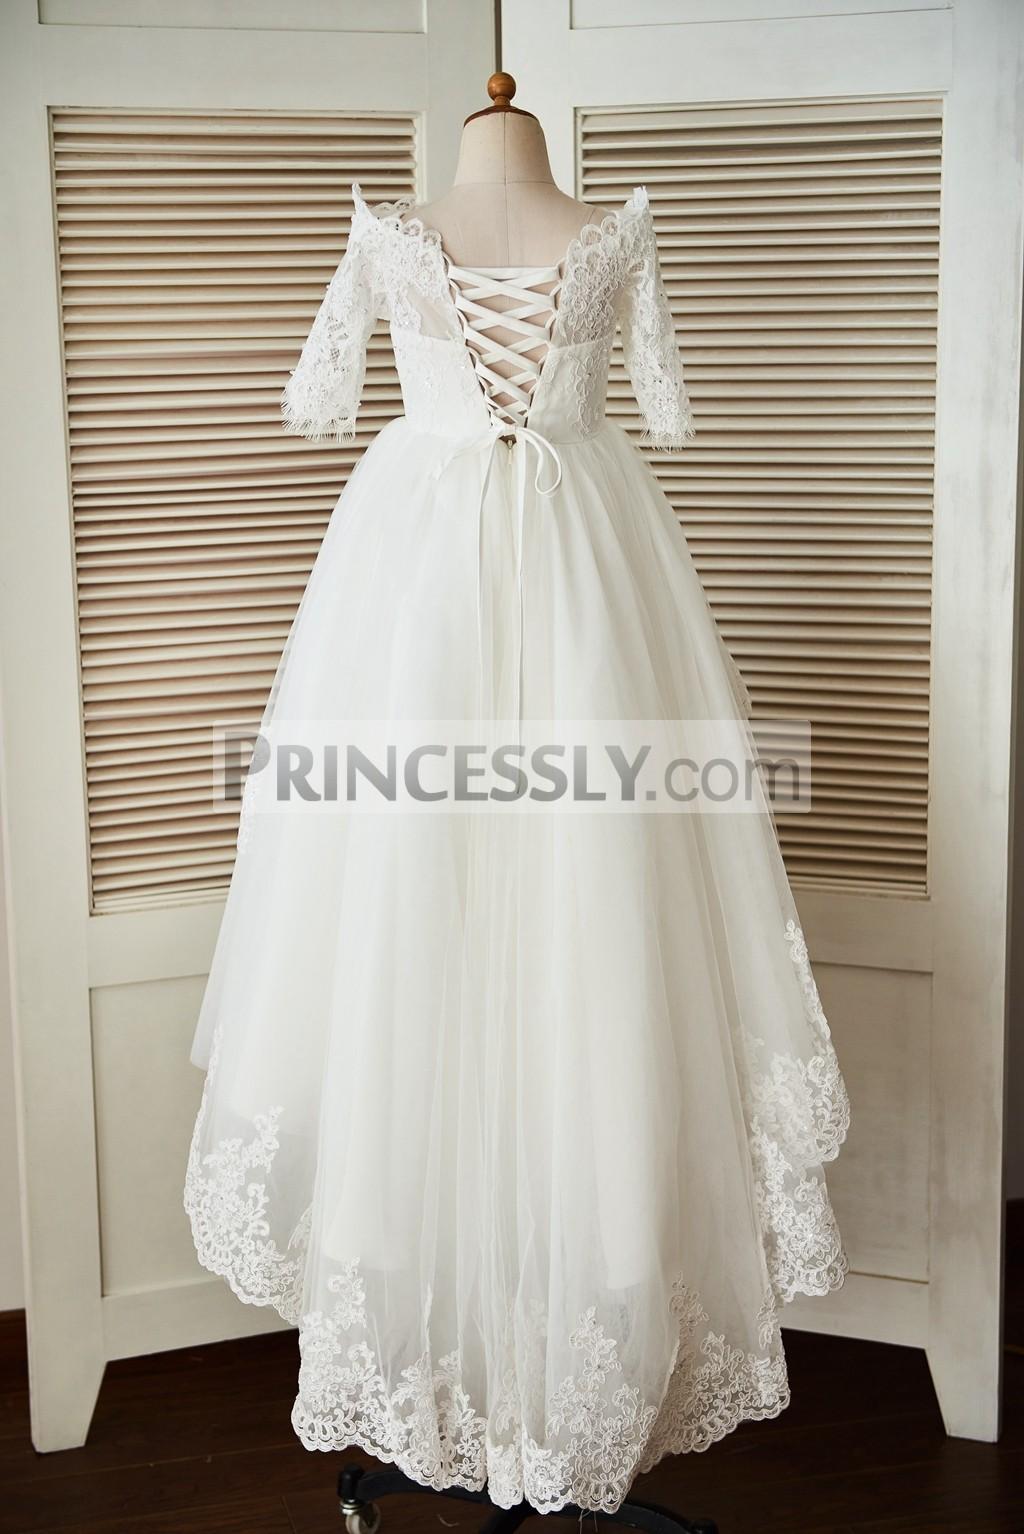 Lace-up back tulle wedding baby girl dress